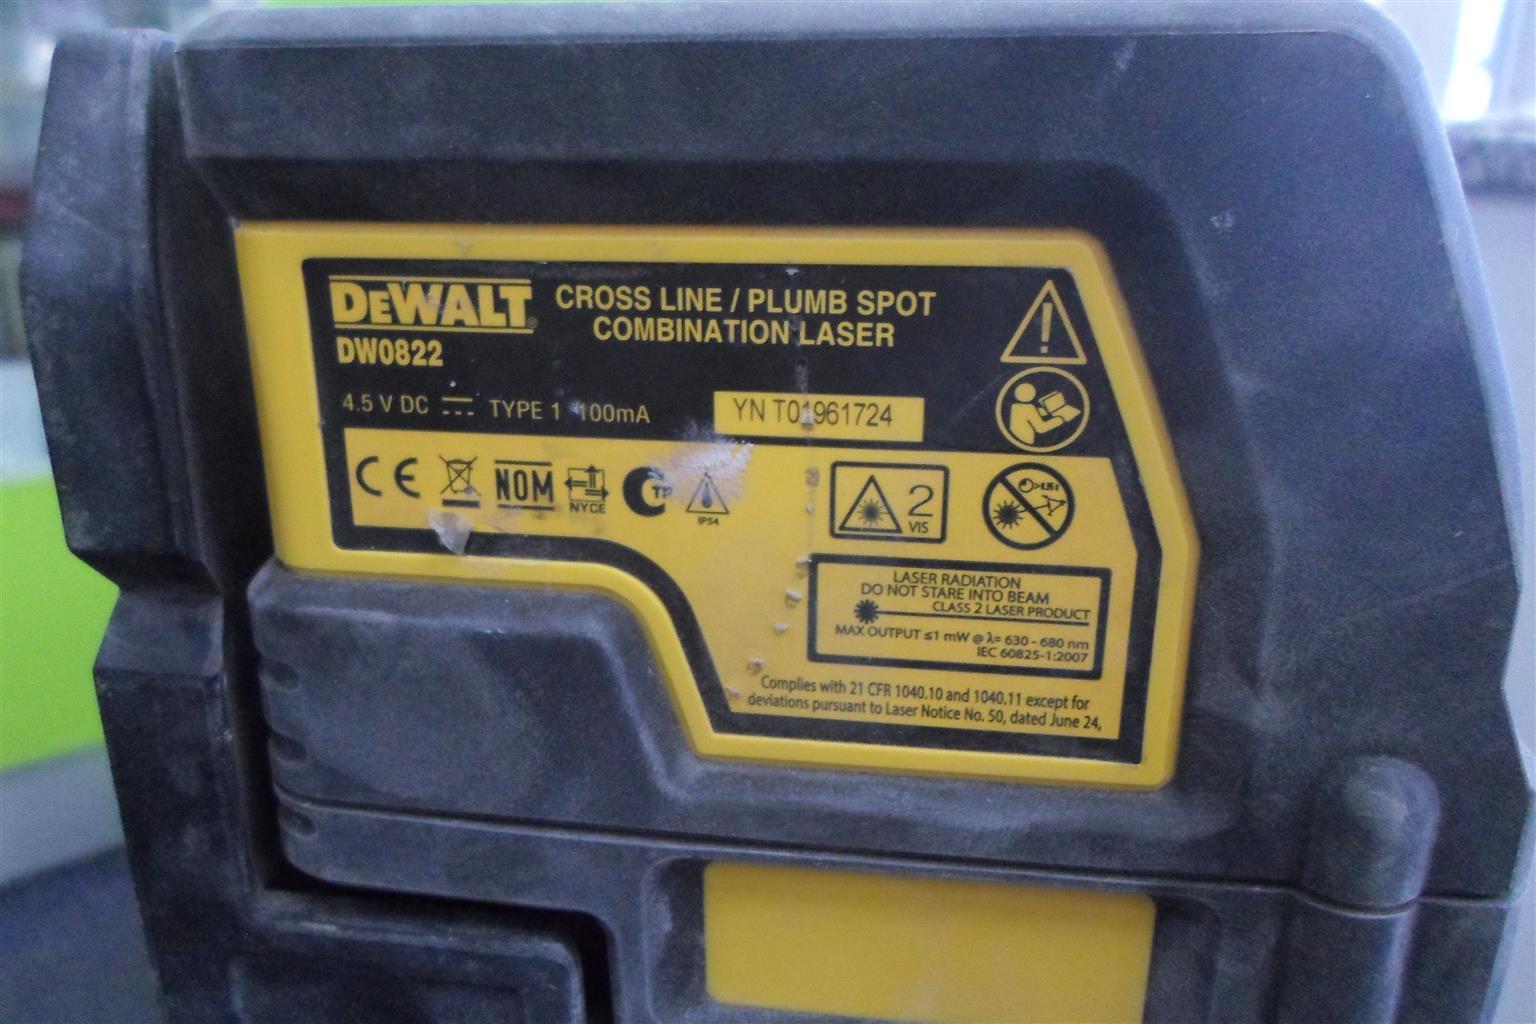 DeWalt DW0822 Cross Line/Plum Spot Combination Laser